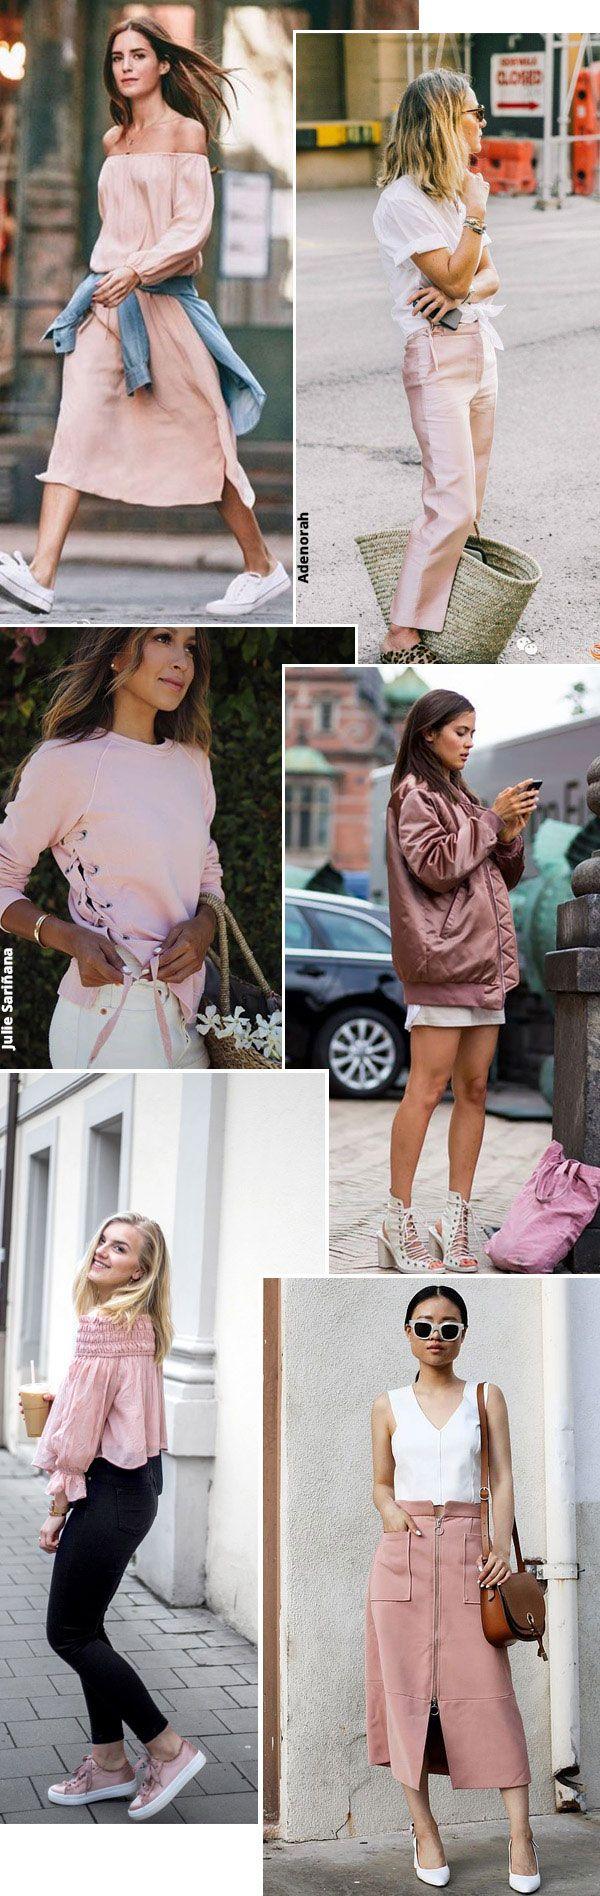 Street style look rosa blush.